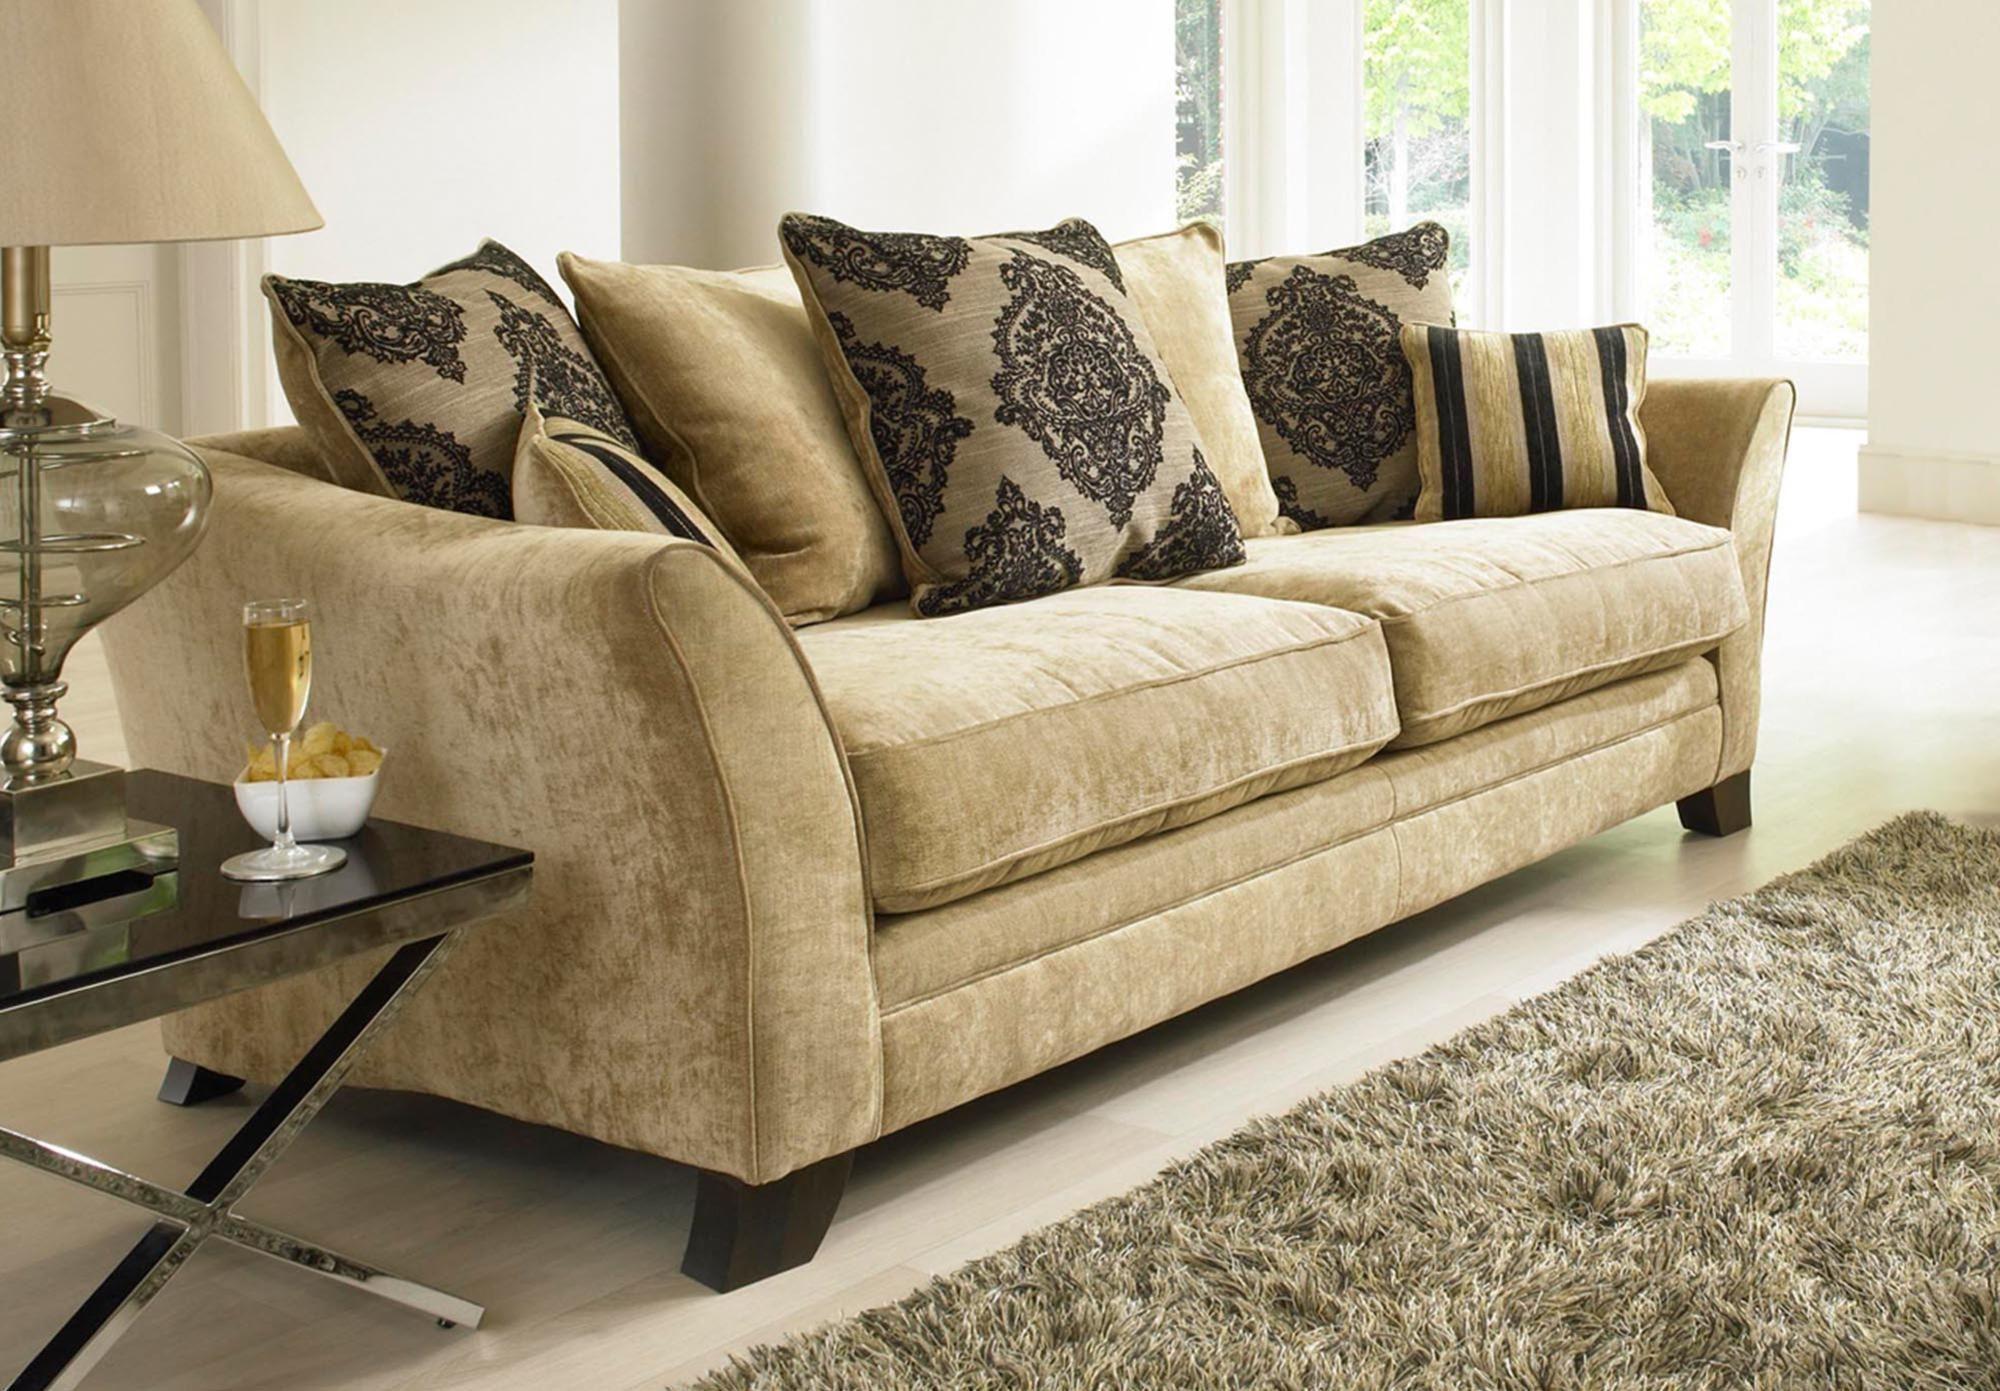 furniture village leather corner sofa bed recliner manufacturers in bangalore sofas